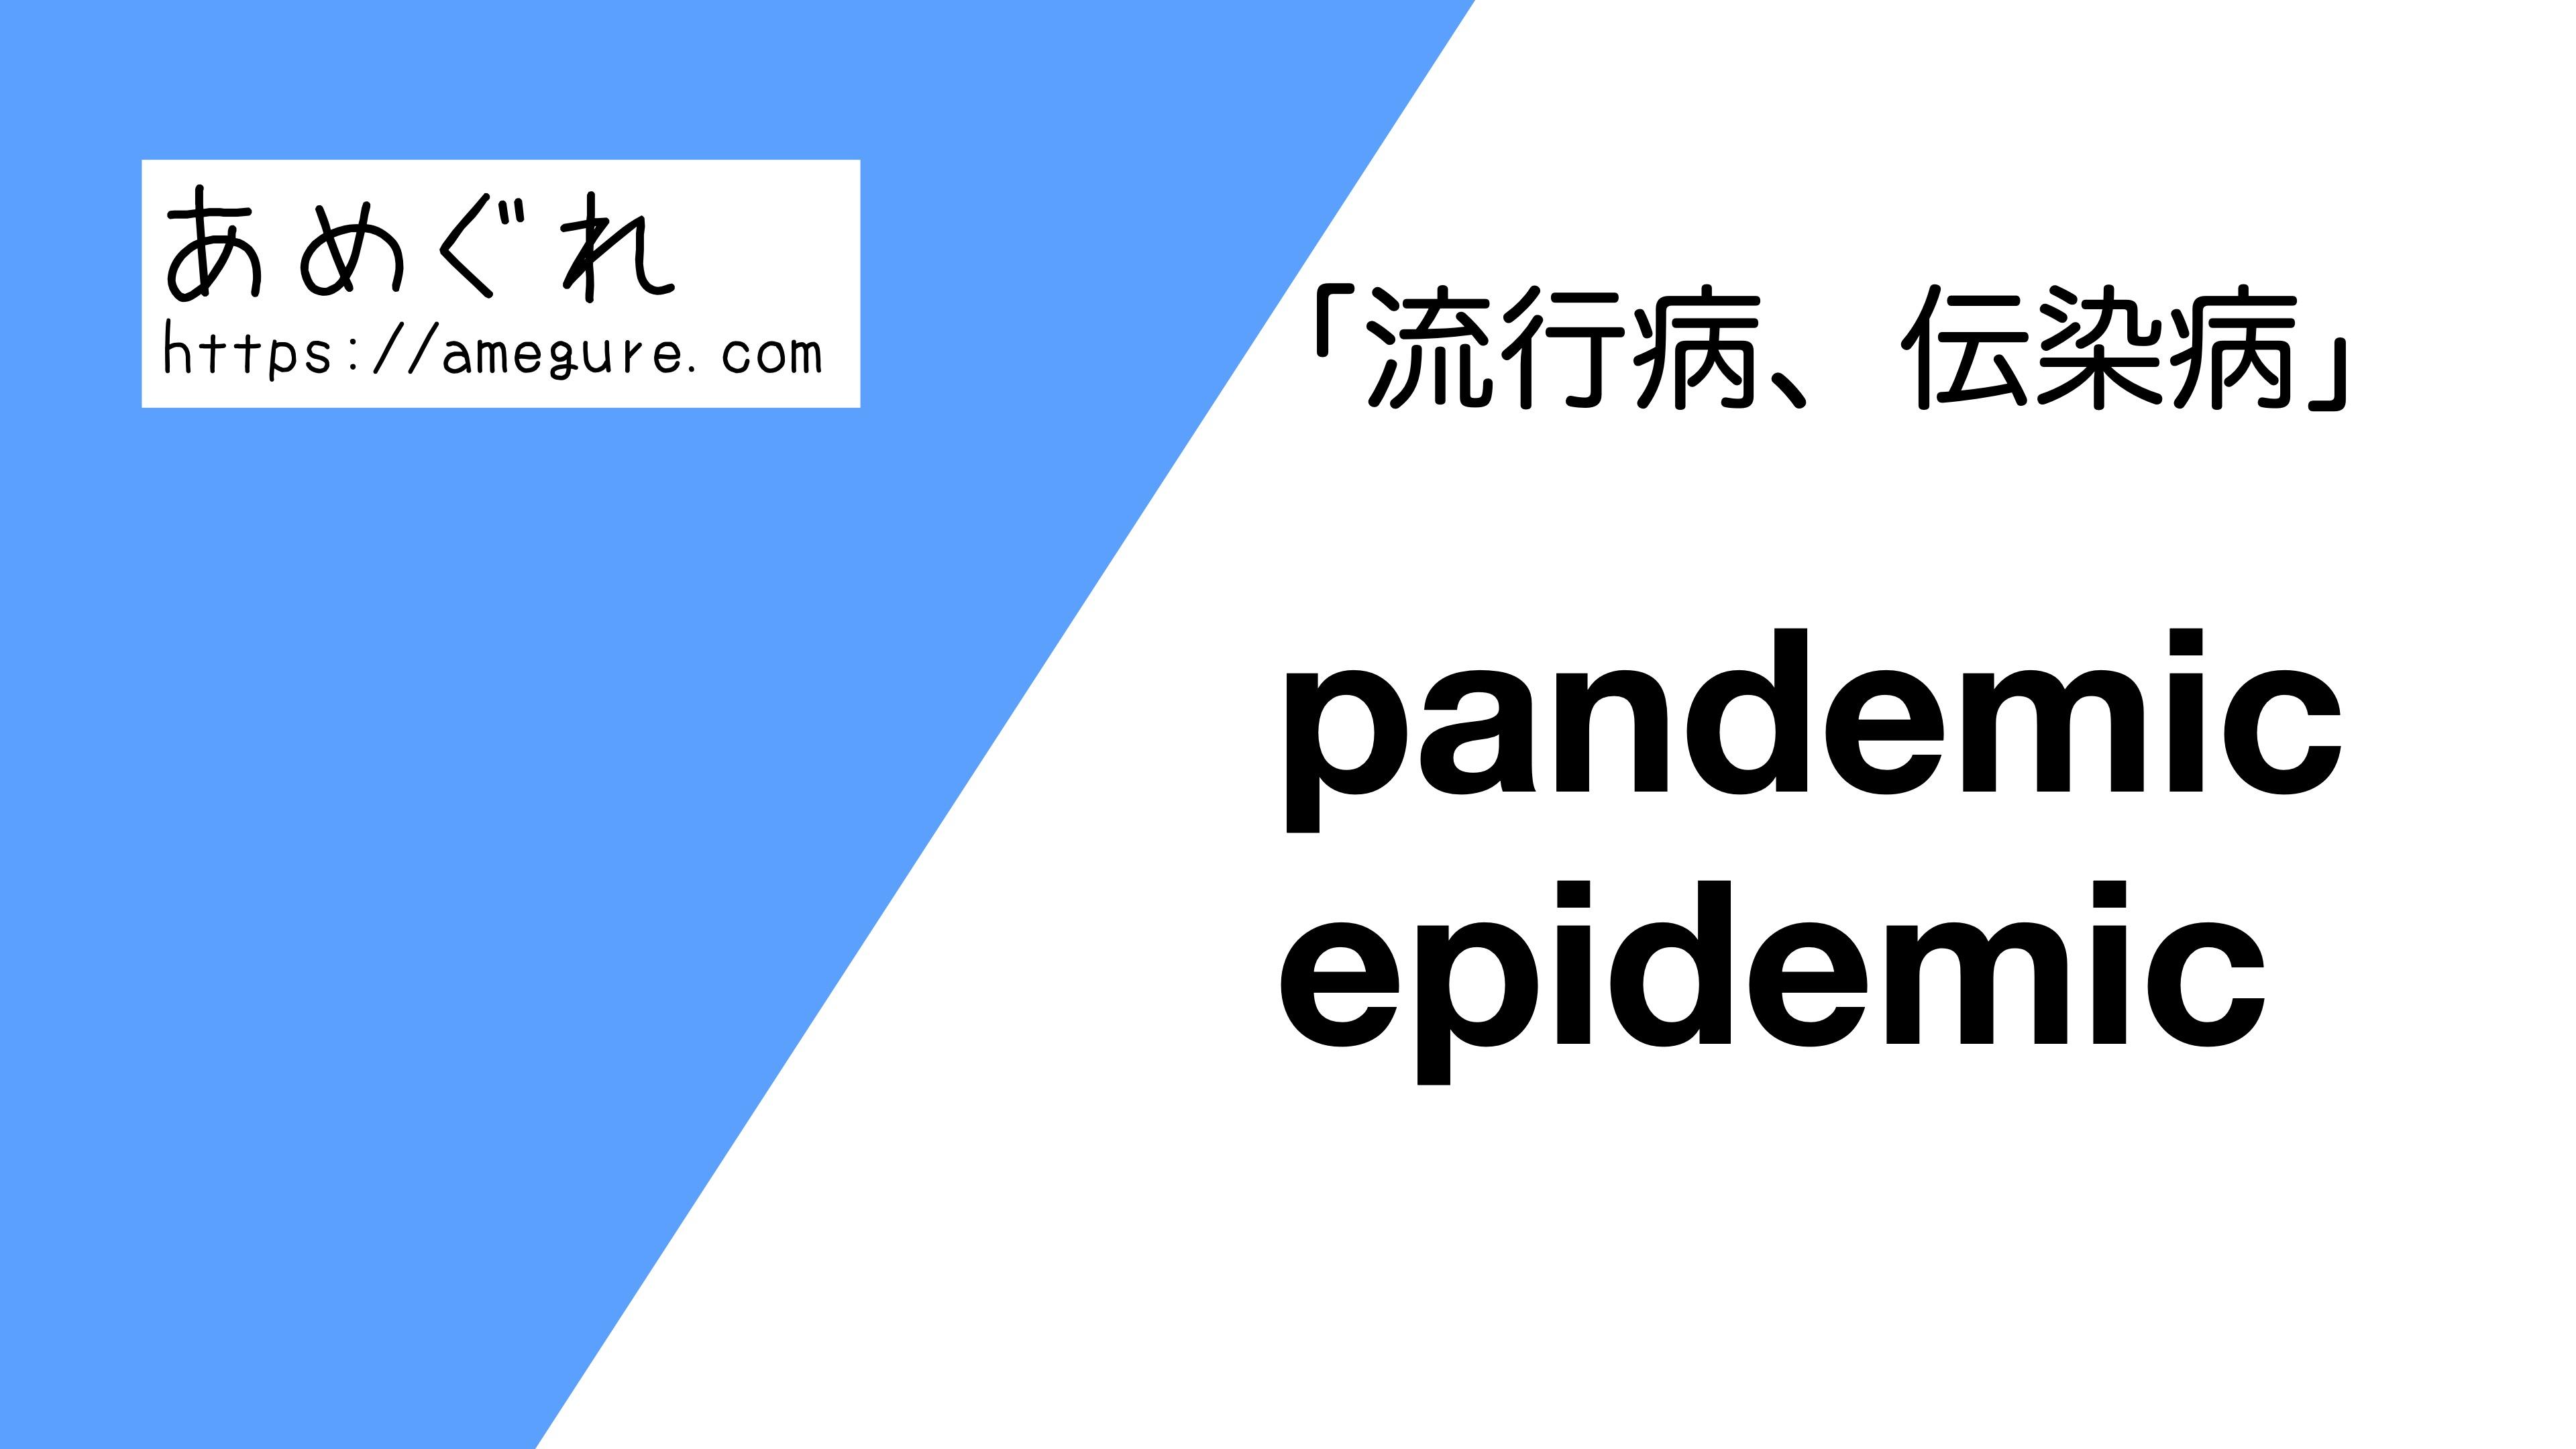 pandemic-epidemic違い